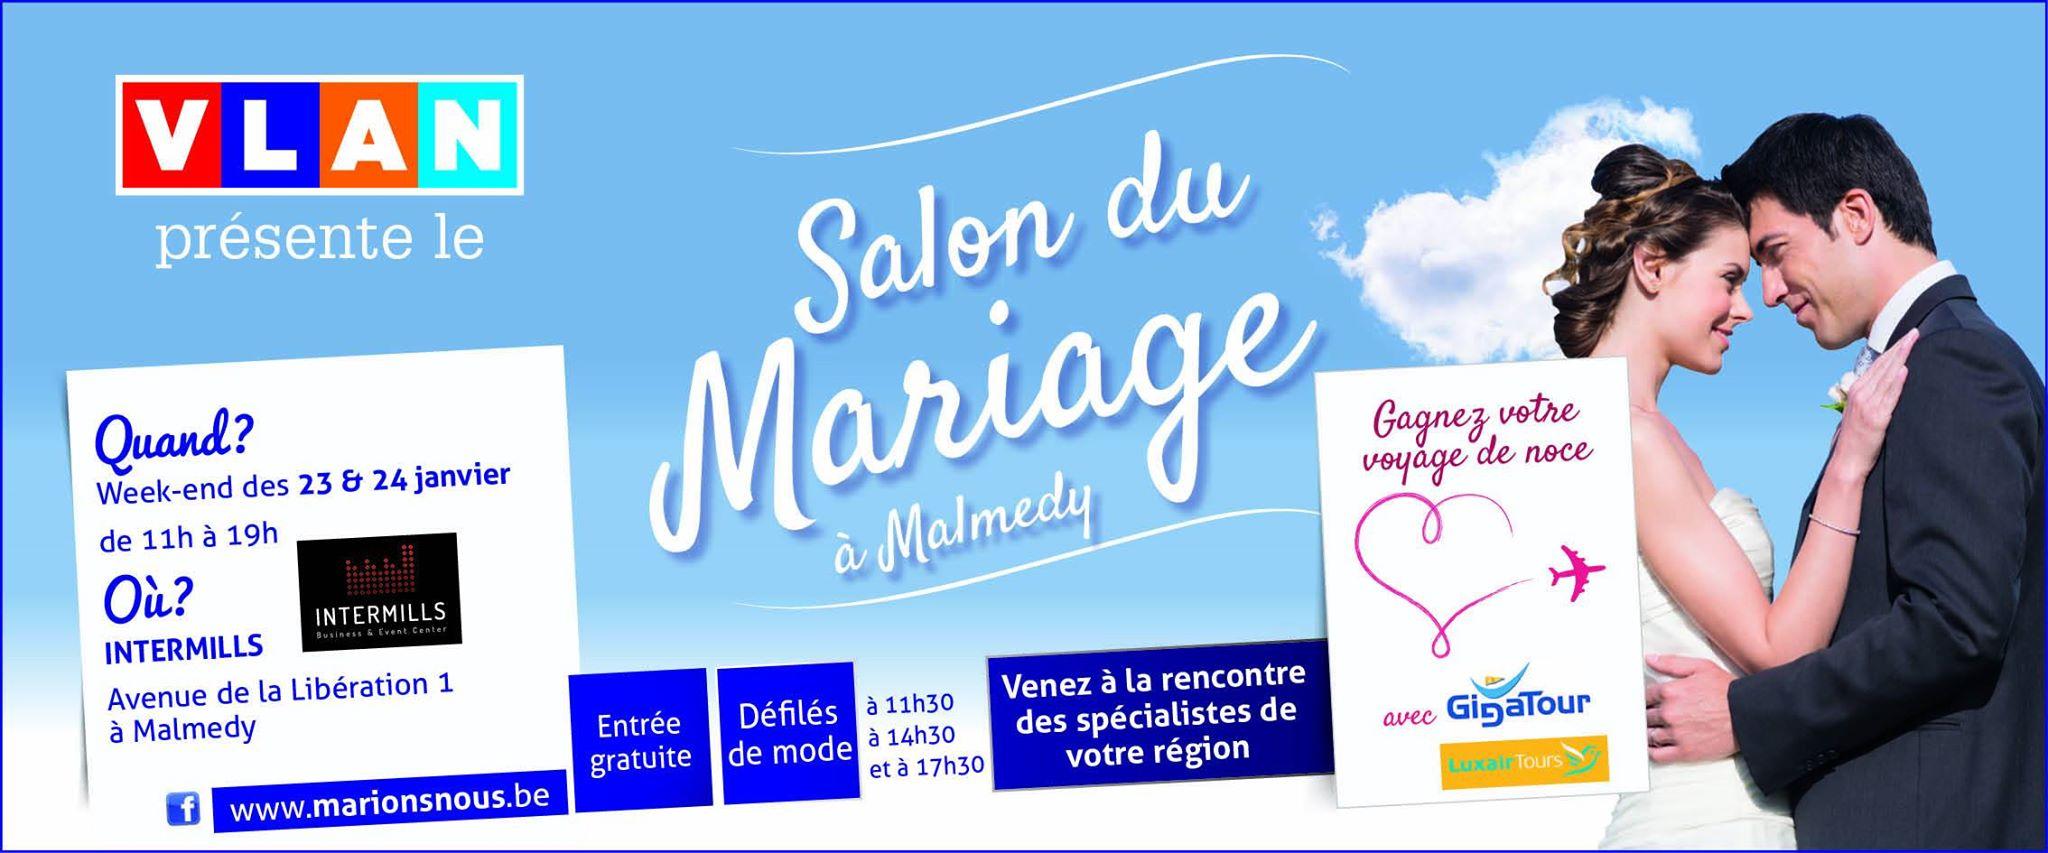 Salon du Mariage Malmedy